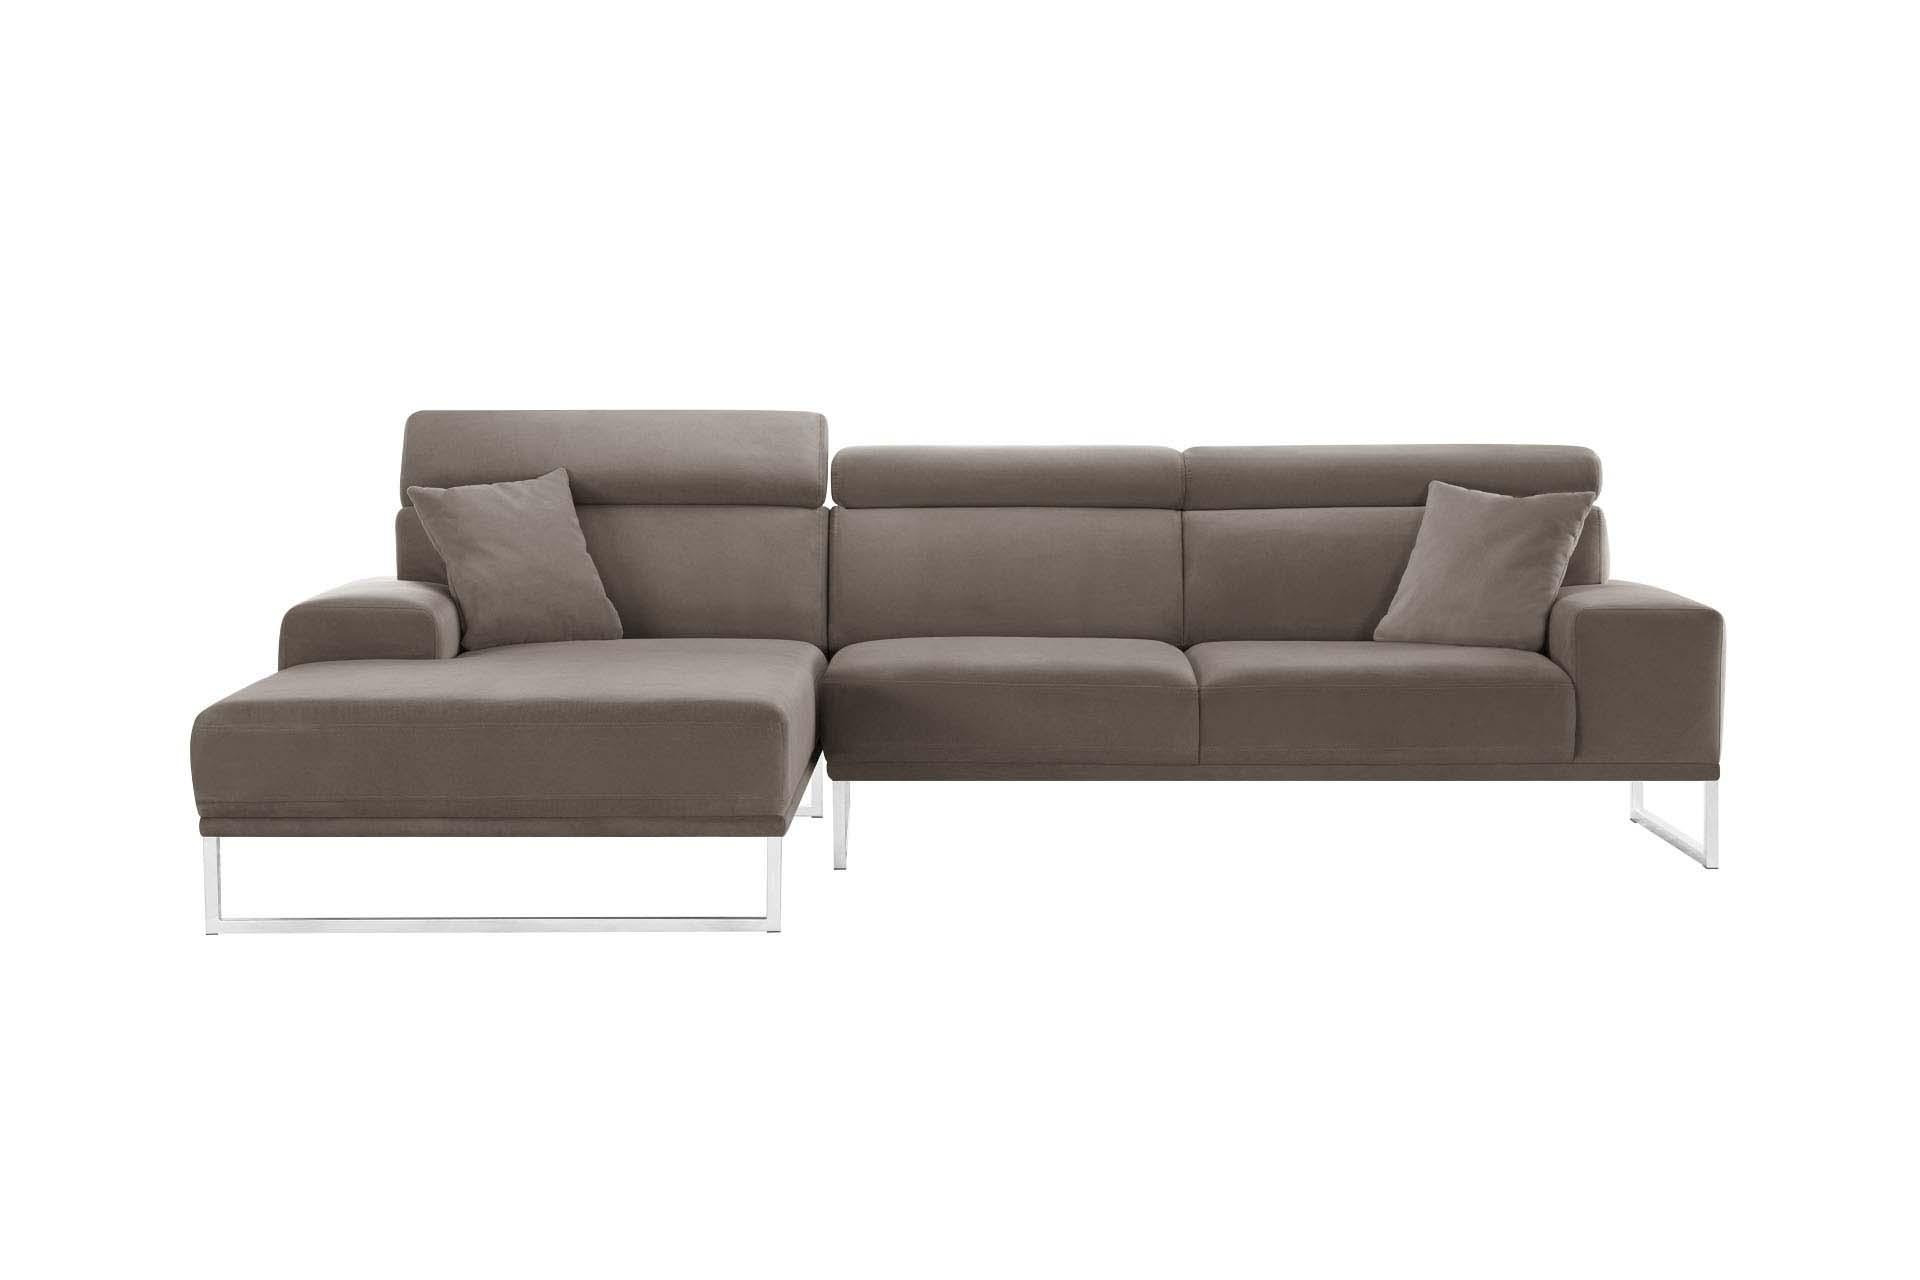 Canapé d'angle 5 places Velours Luxe Confort